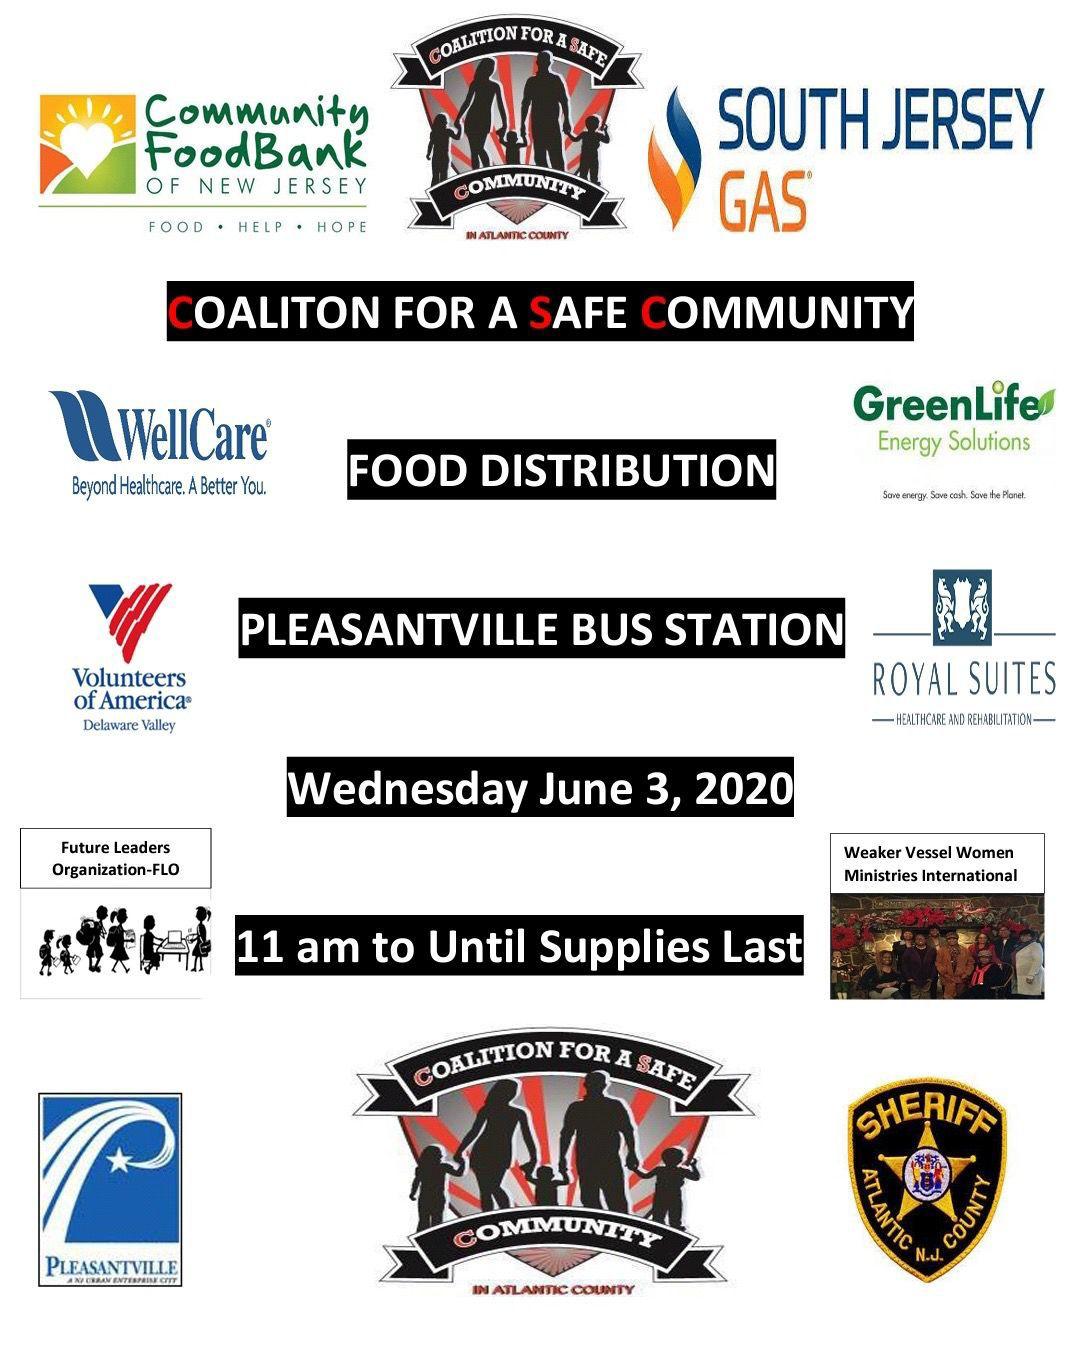 Pleasantville food distrbution